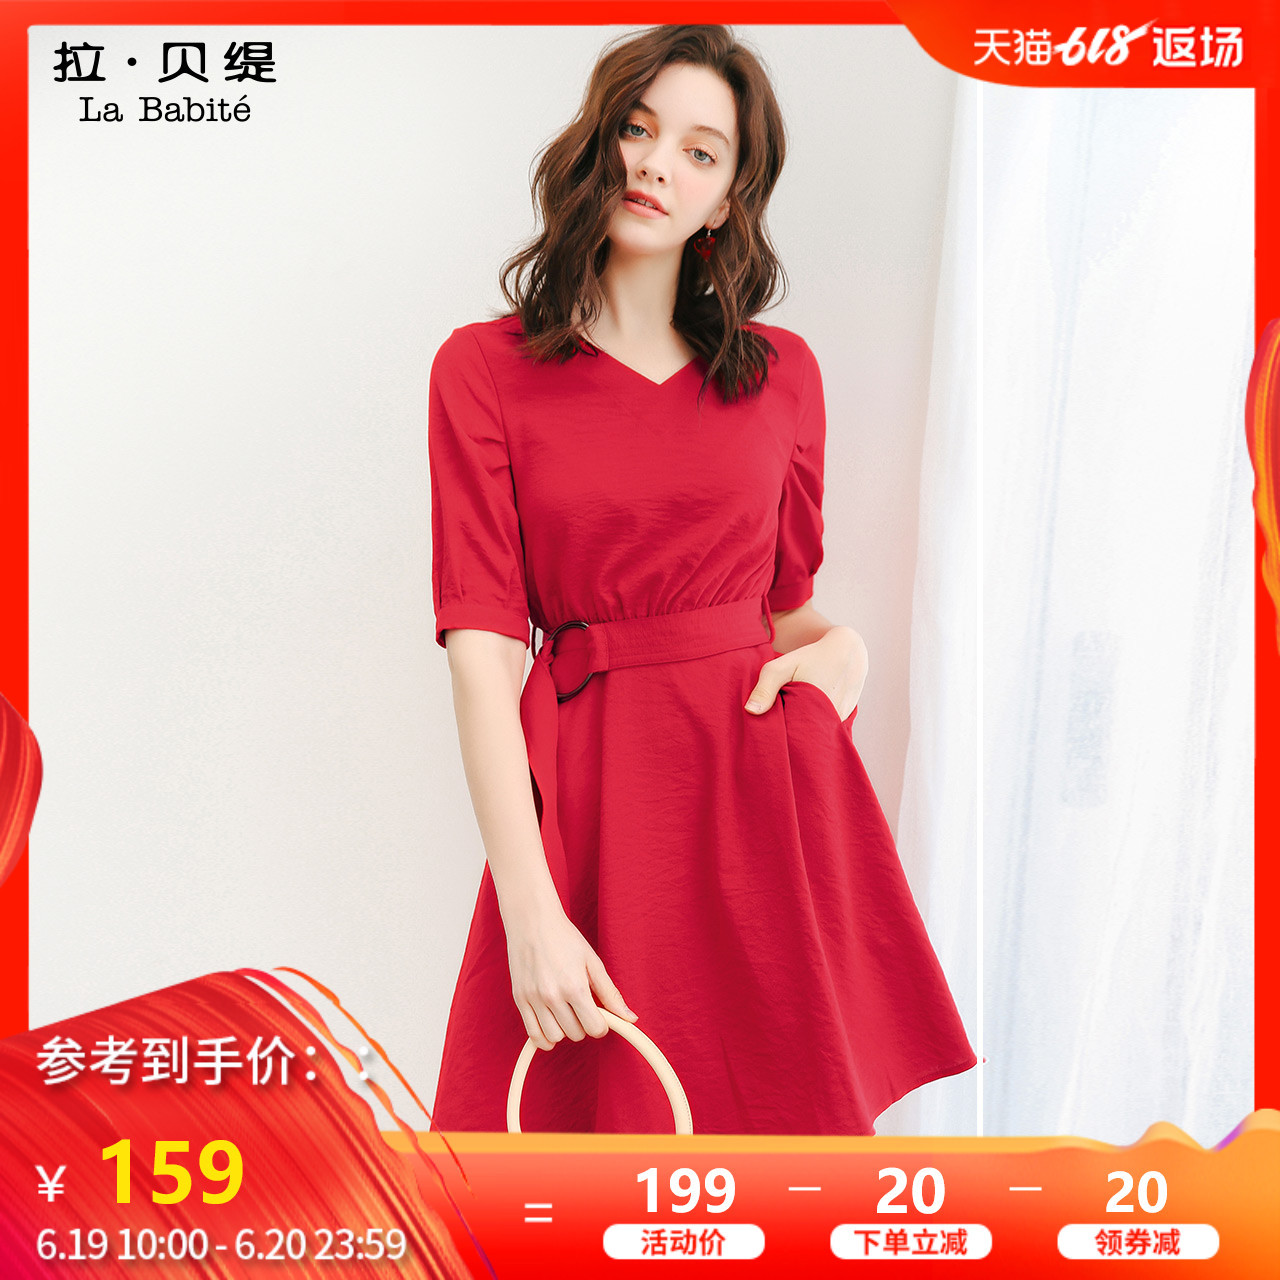 ¥179 La Babite 拉贝缇 60006520 女士V领连衣裙